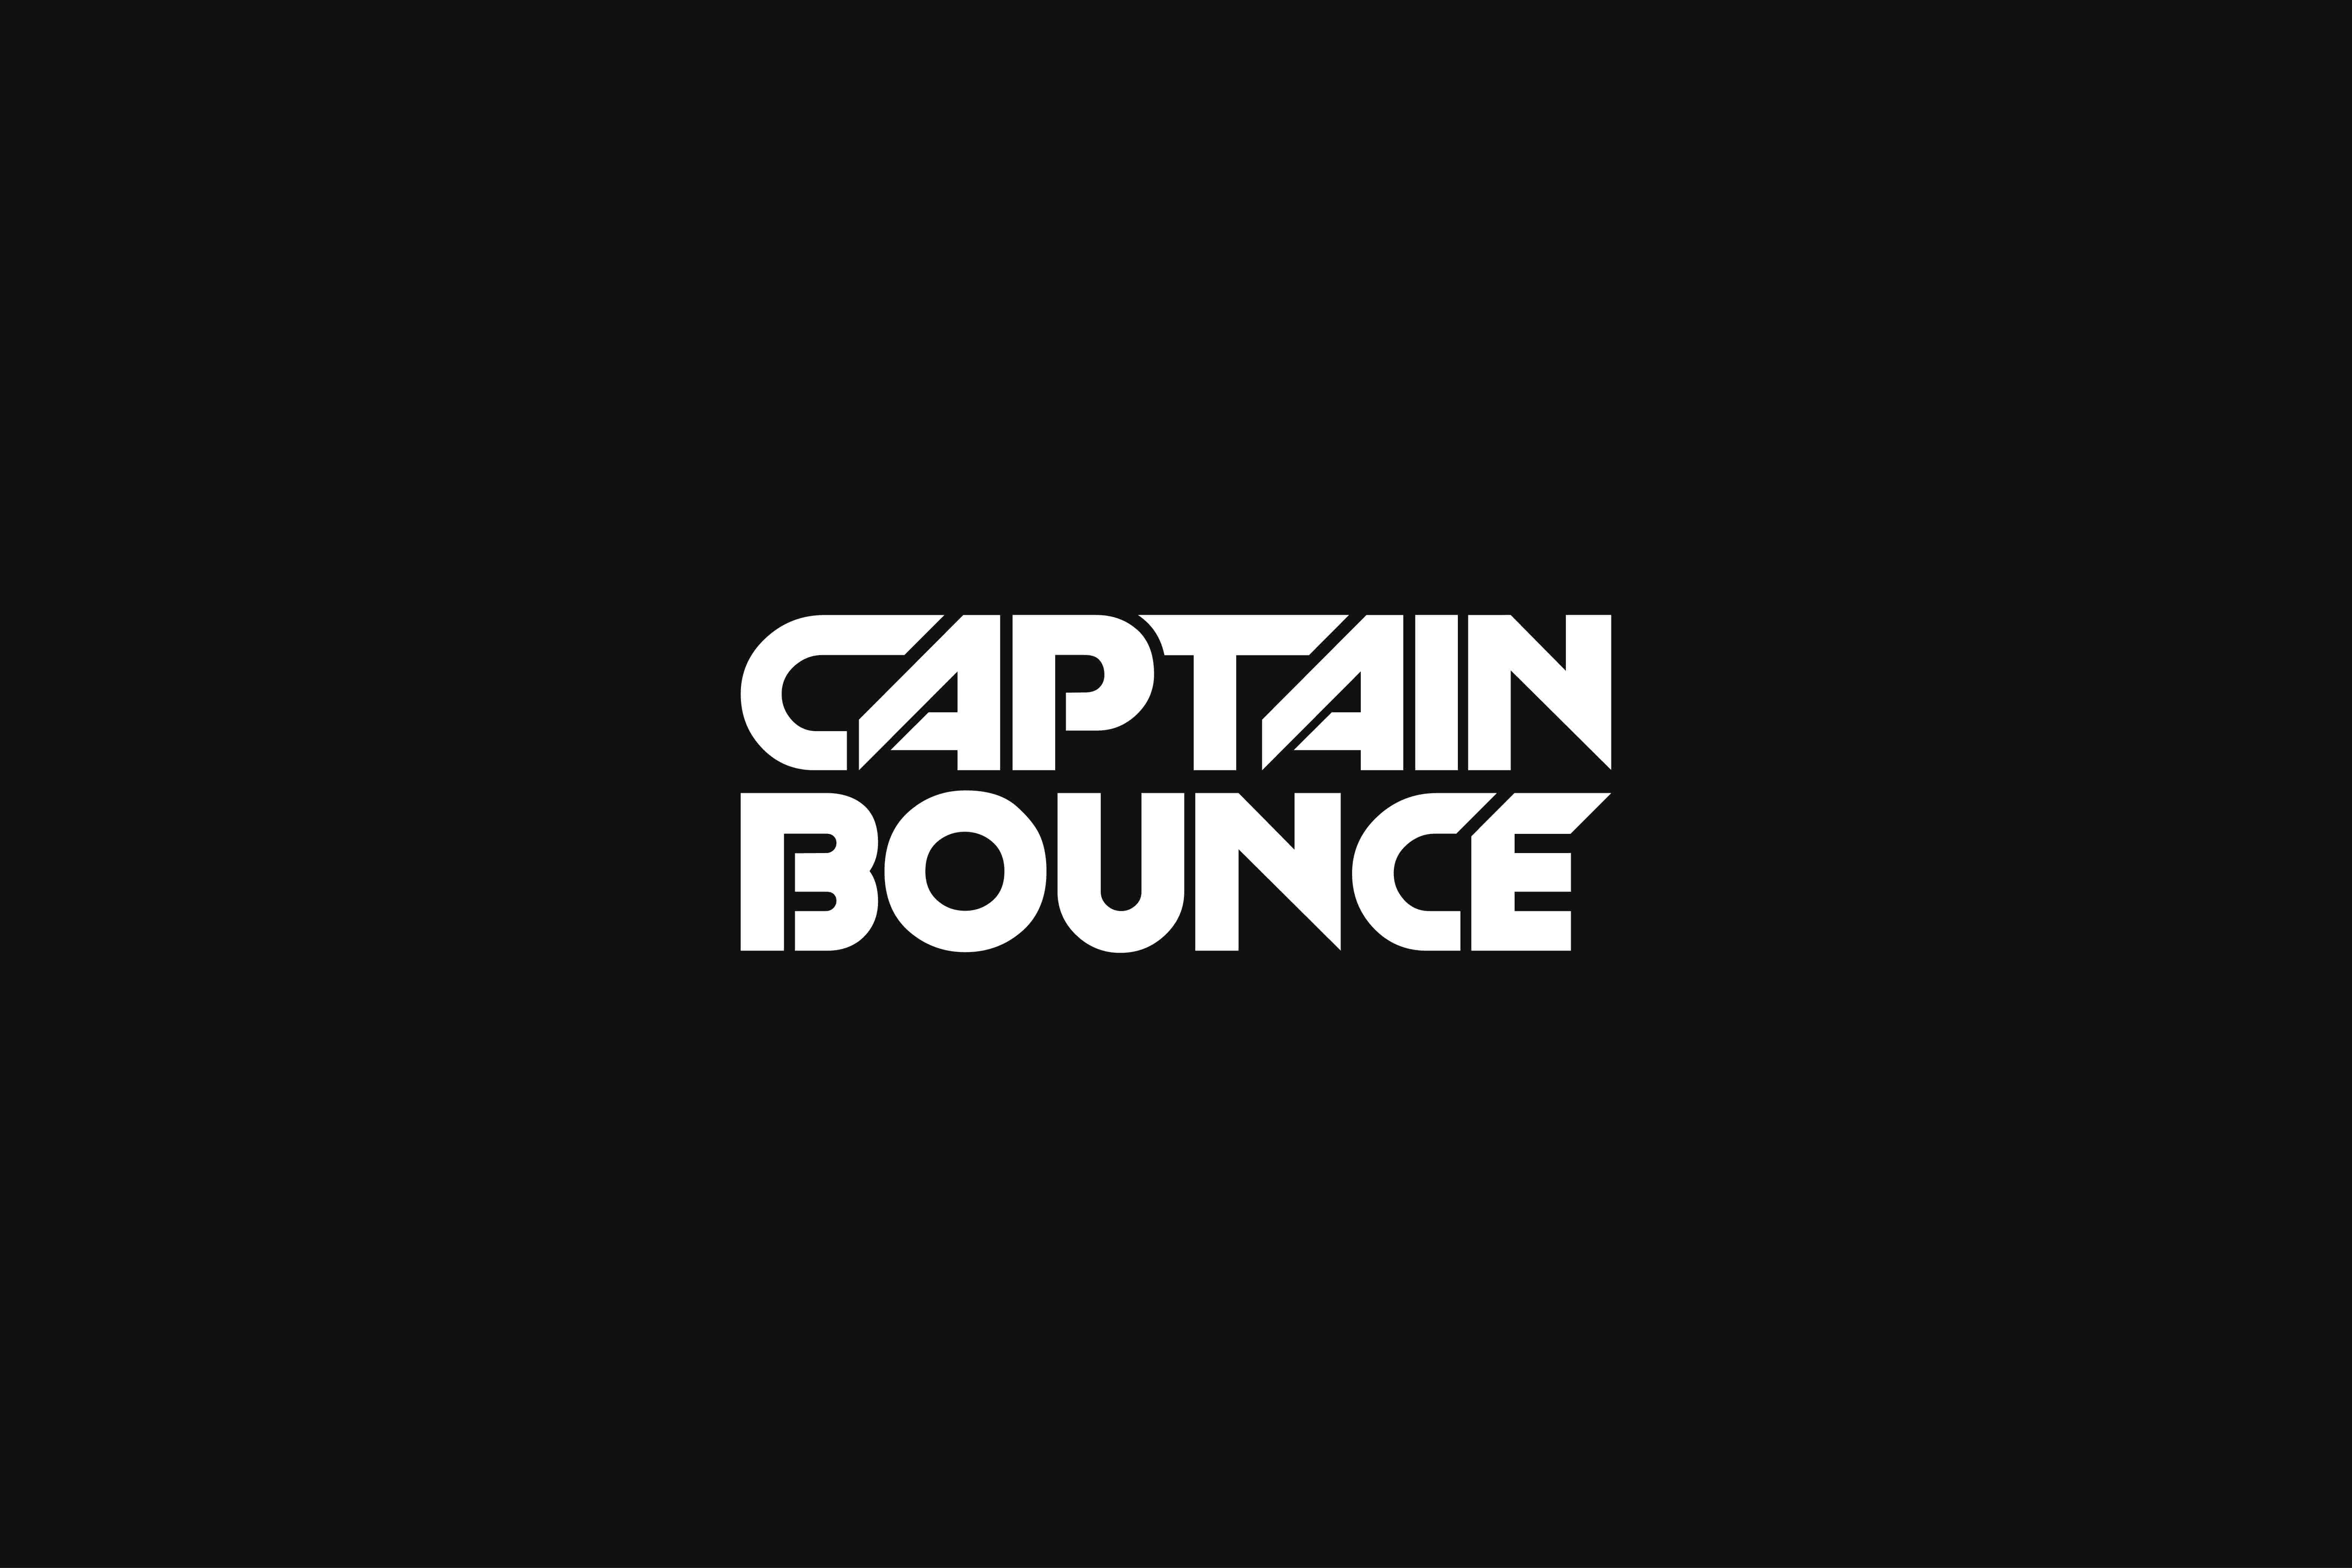 Captain Bounce